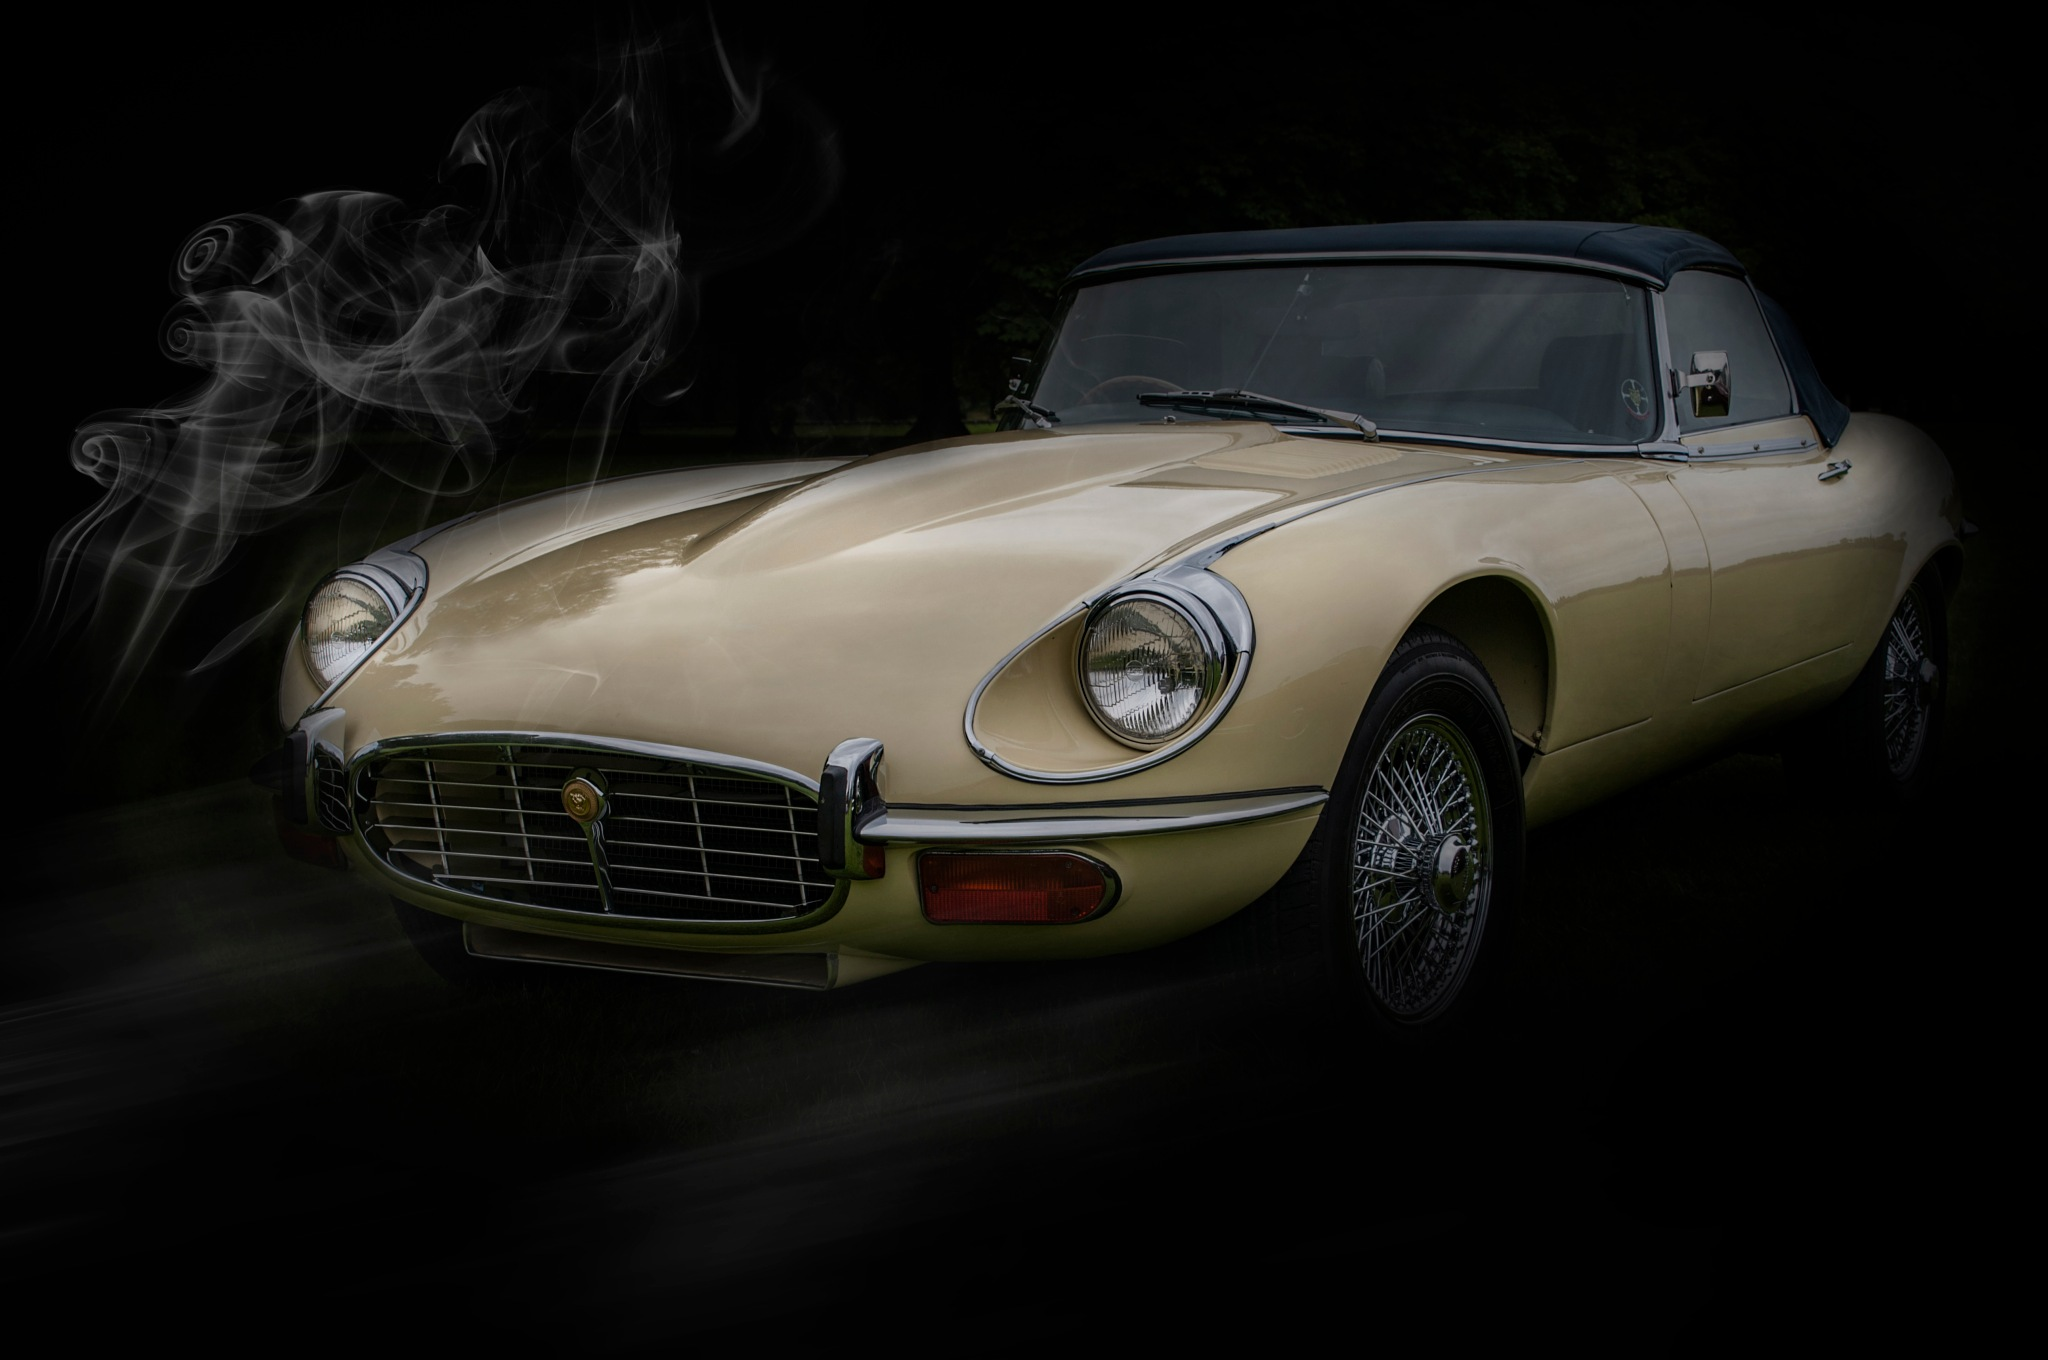 Classic Jaguar #1 by Haydn Bailey